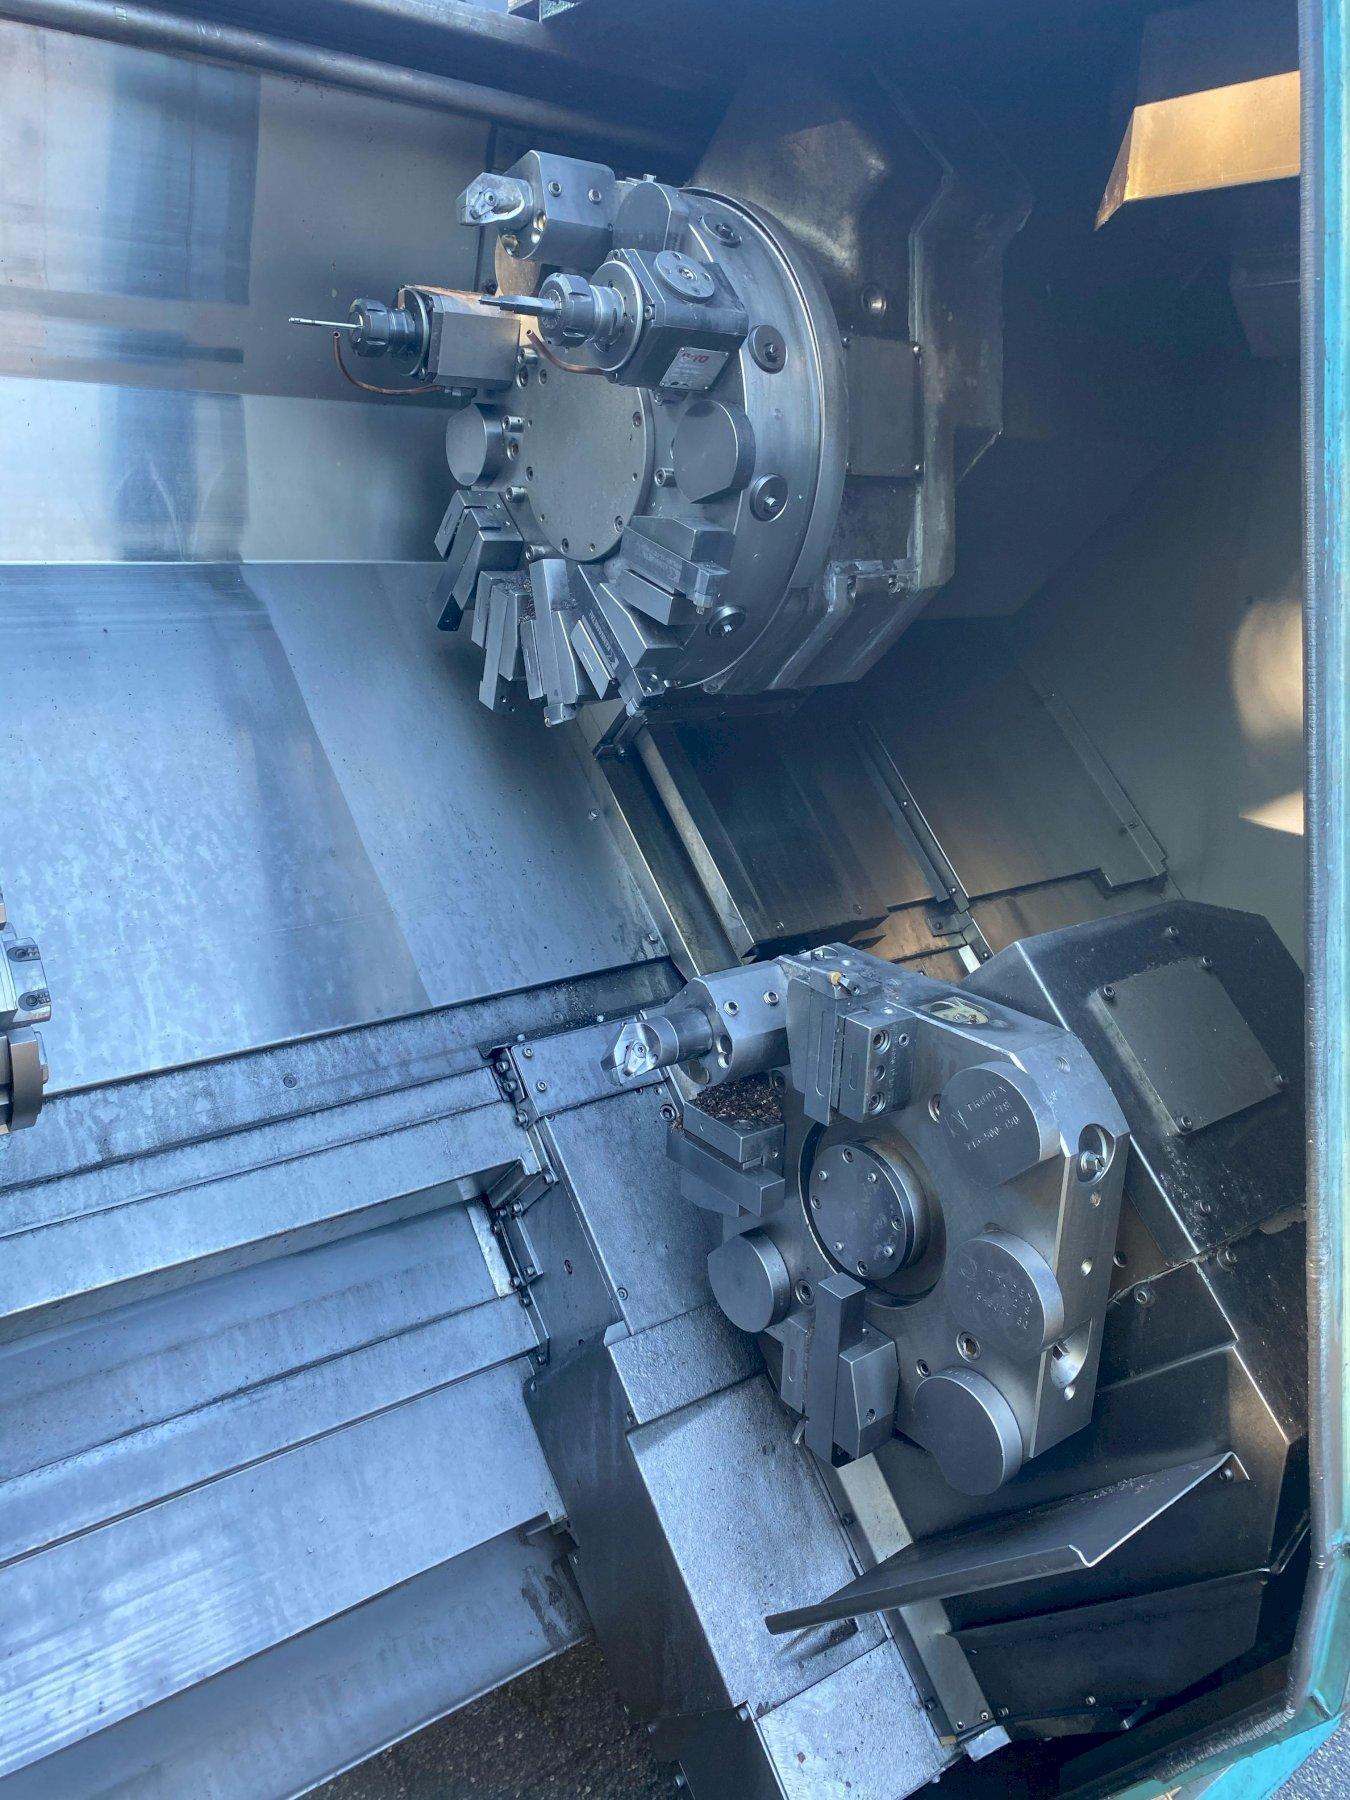 Okuma Impact LU15M CNC Twin Turret Live Tool Turning Center